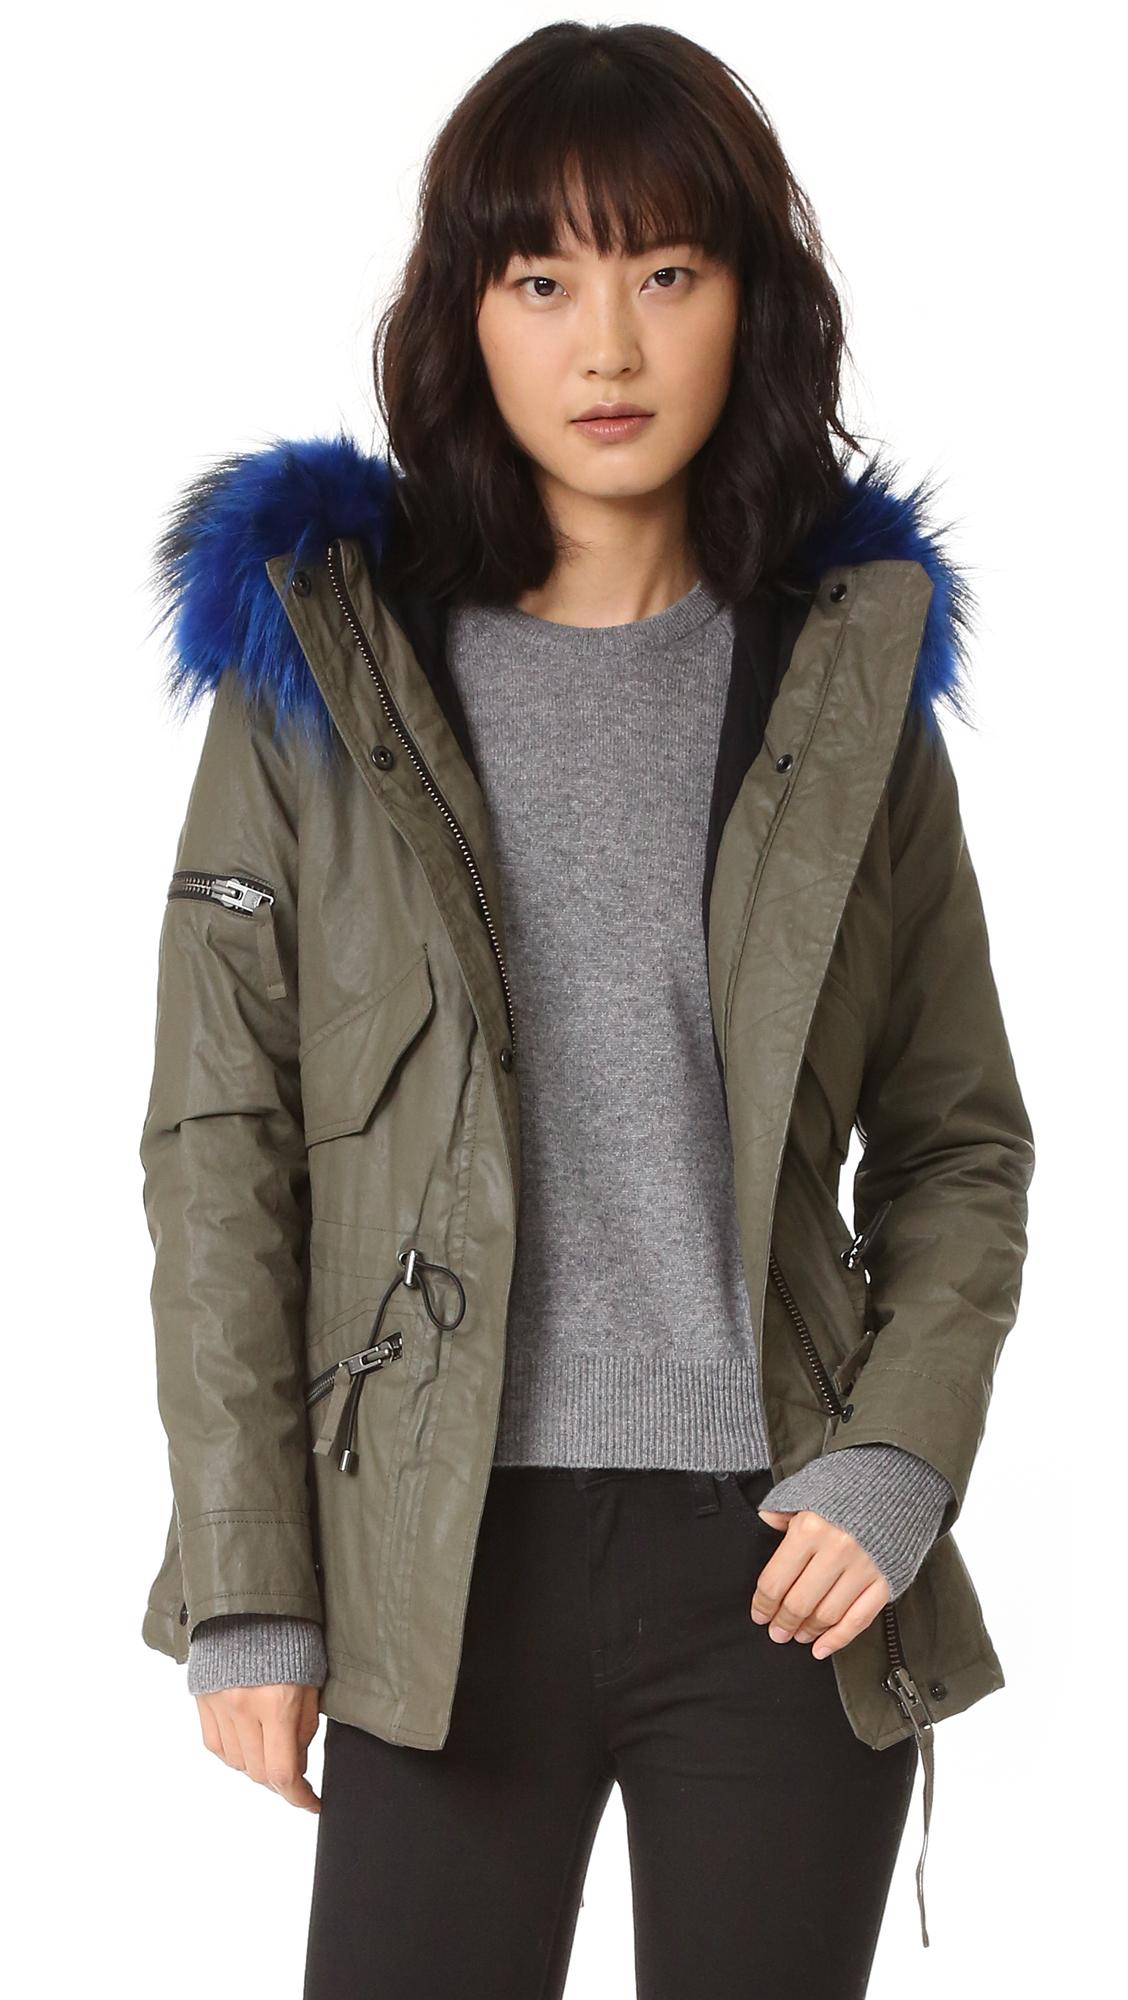 fc0b05f040d Sam. Mini Hudson Parka - Army/Blue | Shop Your Way: Online Shopping ...